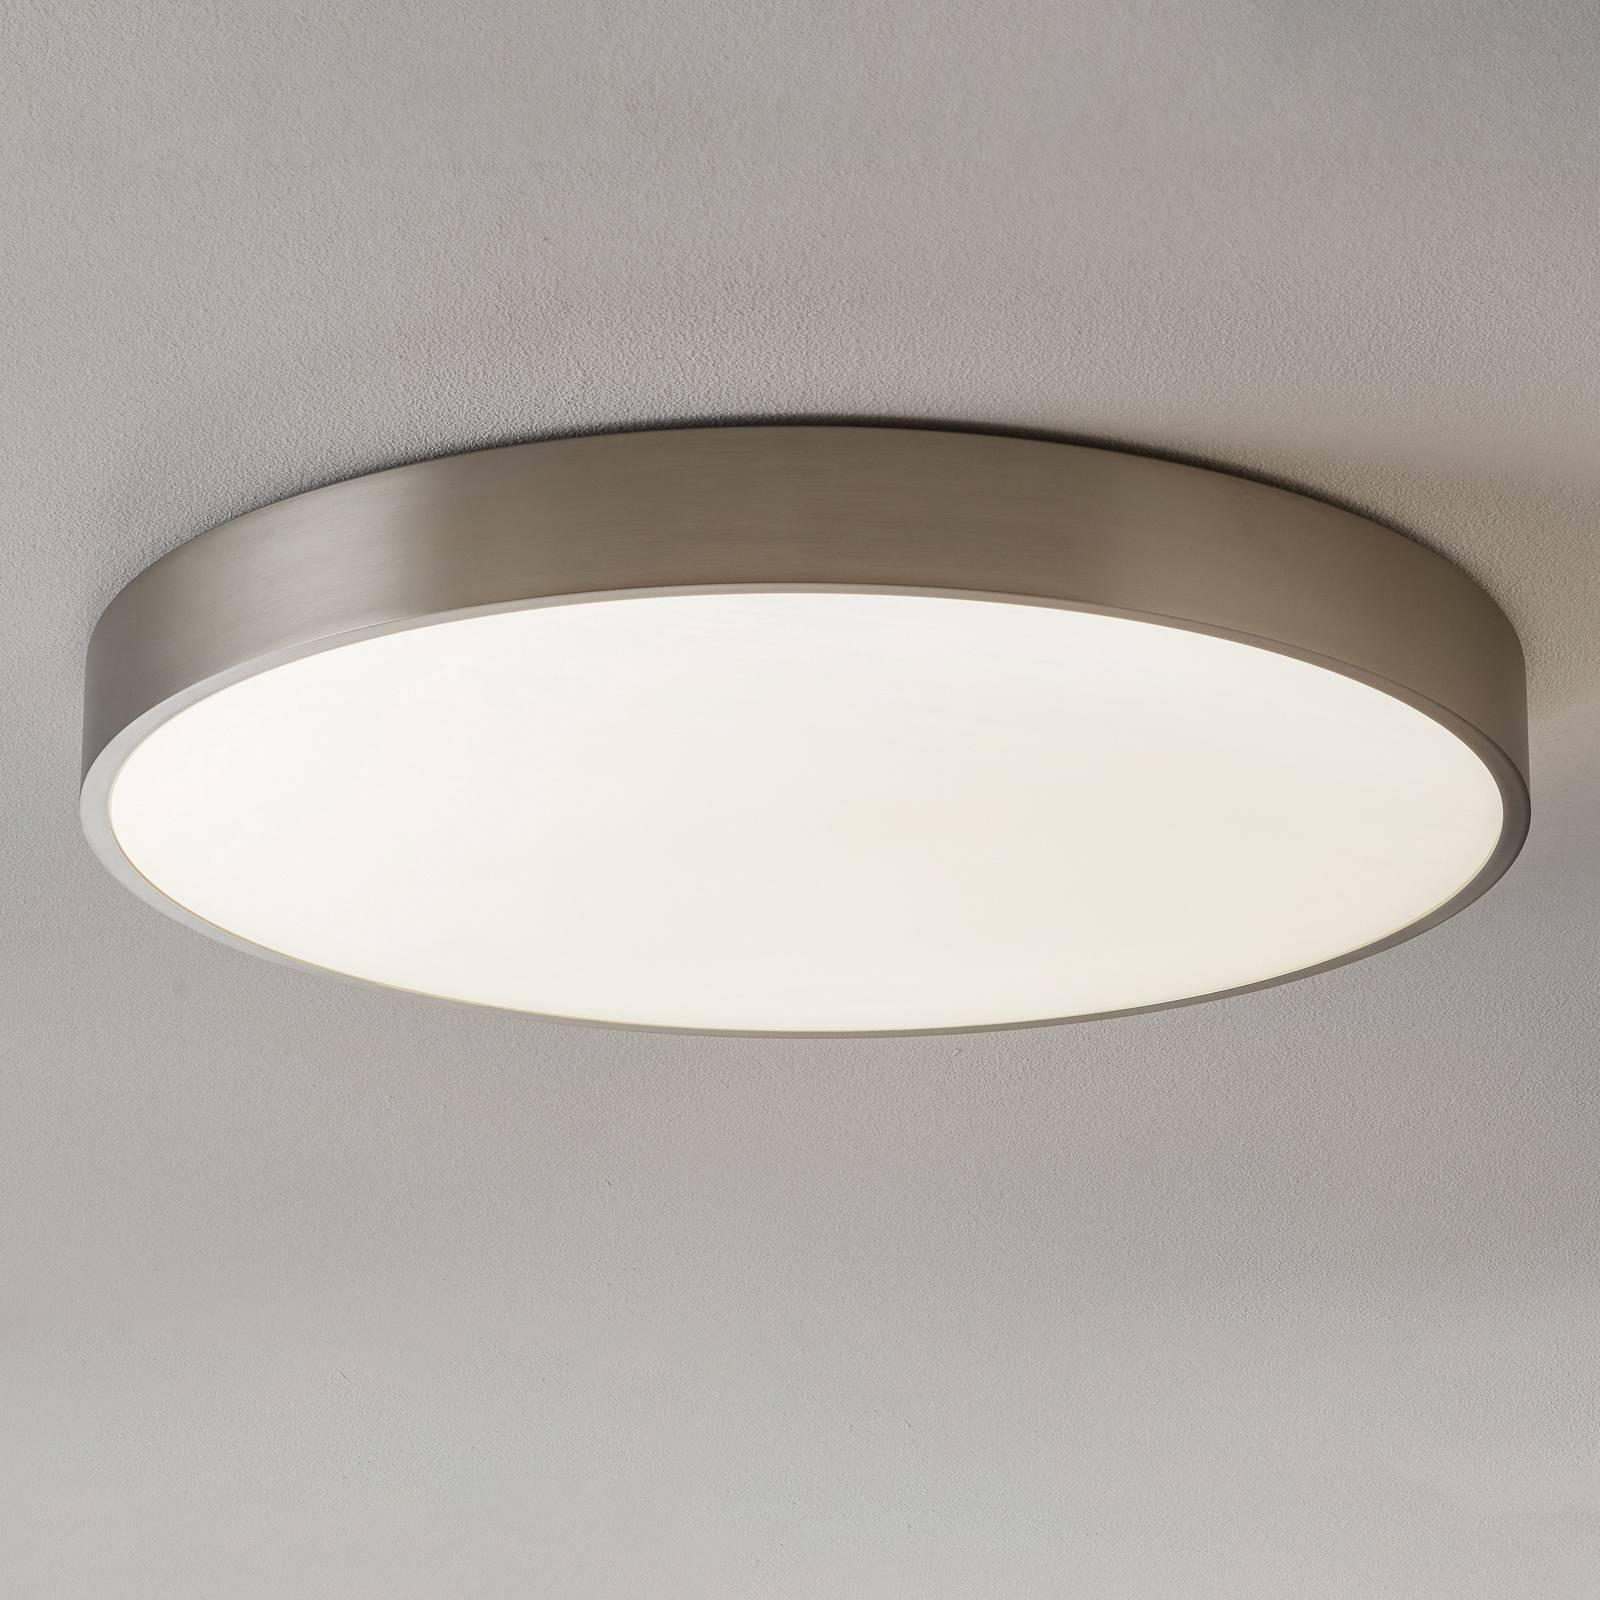 BEGA Planeta lampa sufitowa DALI stal Ø 75cm